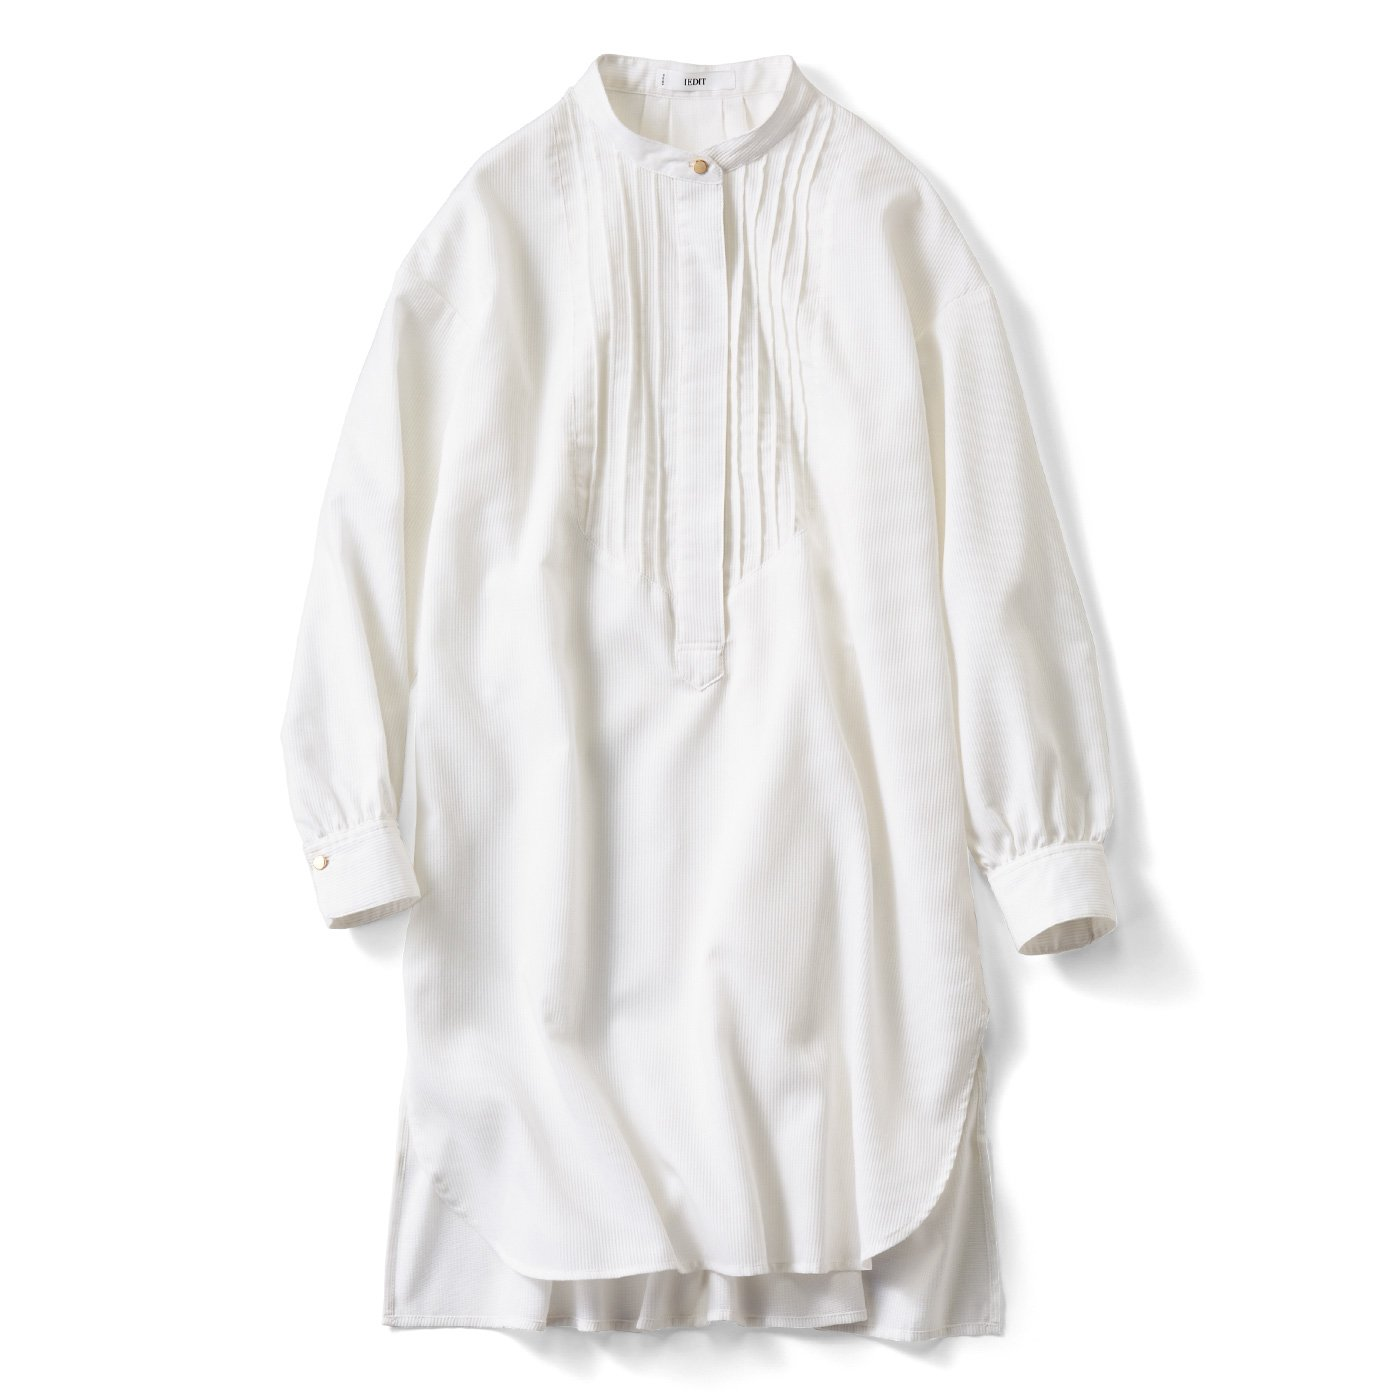 IEDIT[イディット] 撥水加工がうれしい すっきり見えバンドカラーのシャツチュニック〈ホワイト〉